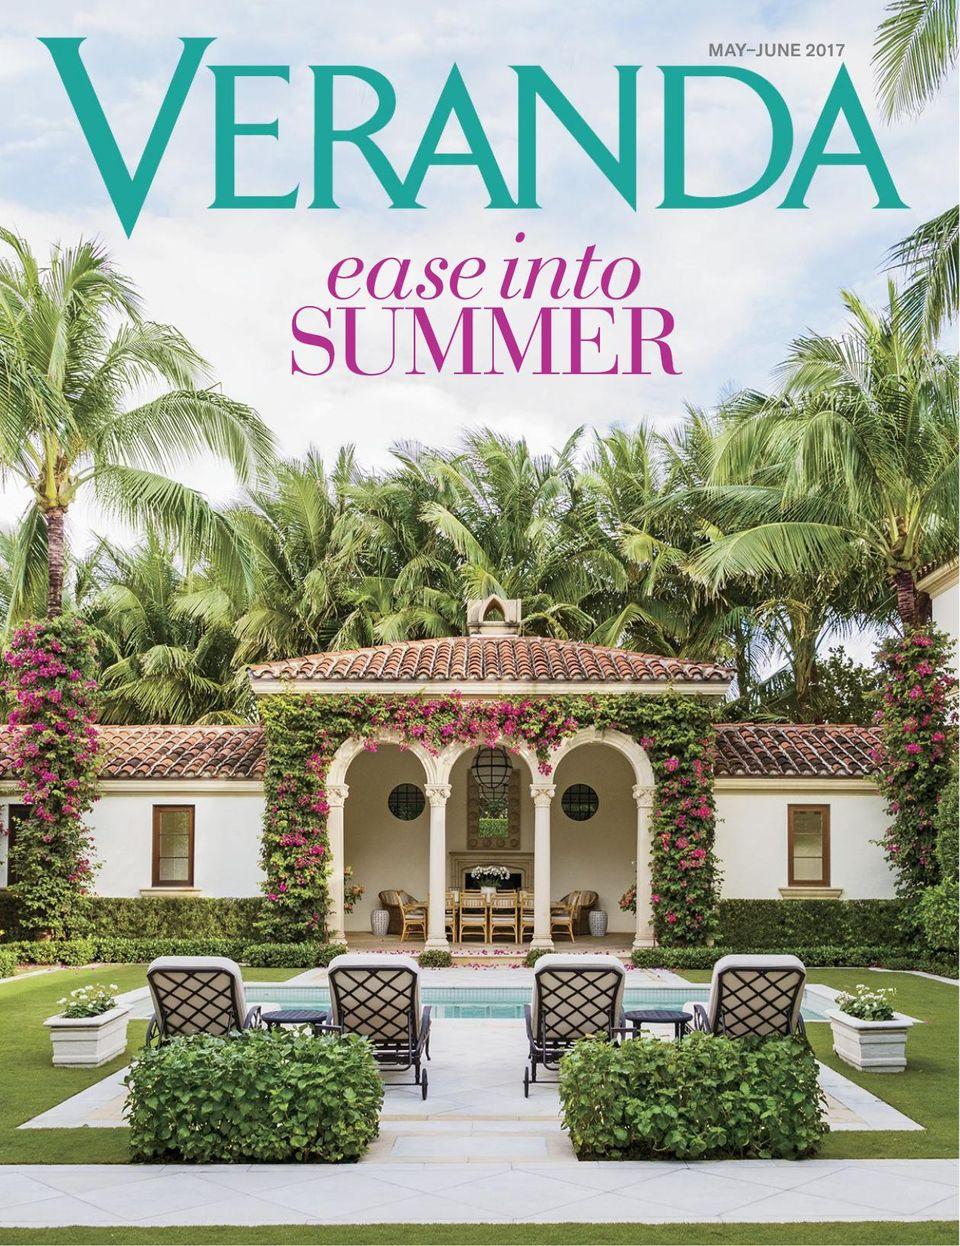 Veranda-May/June 2017 Magazine - Get your Digital Subscription